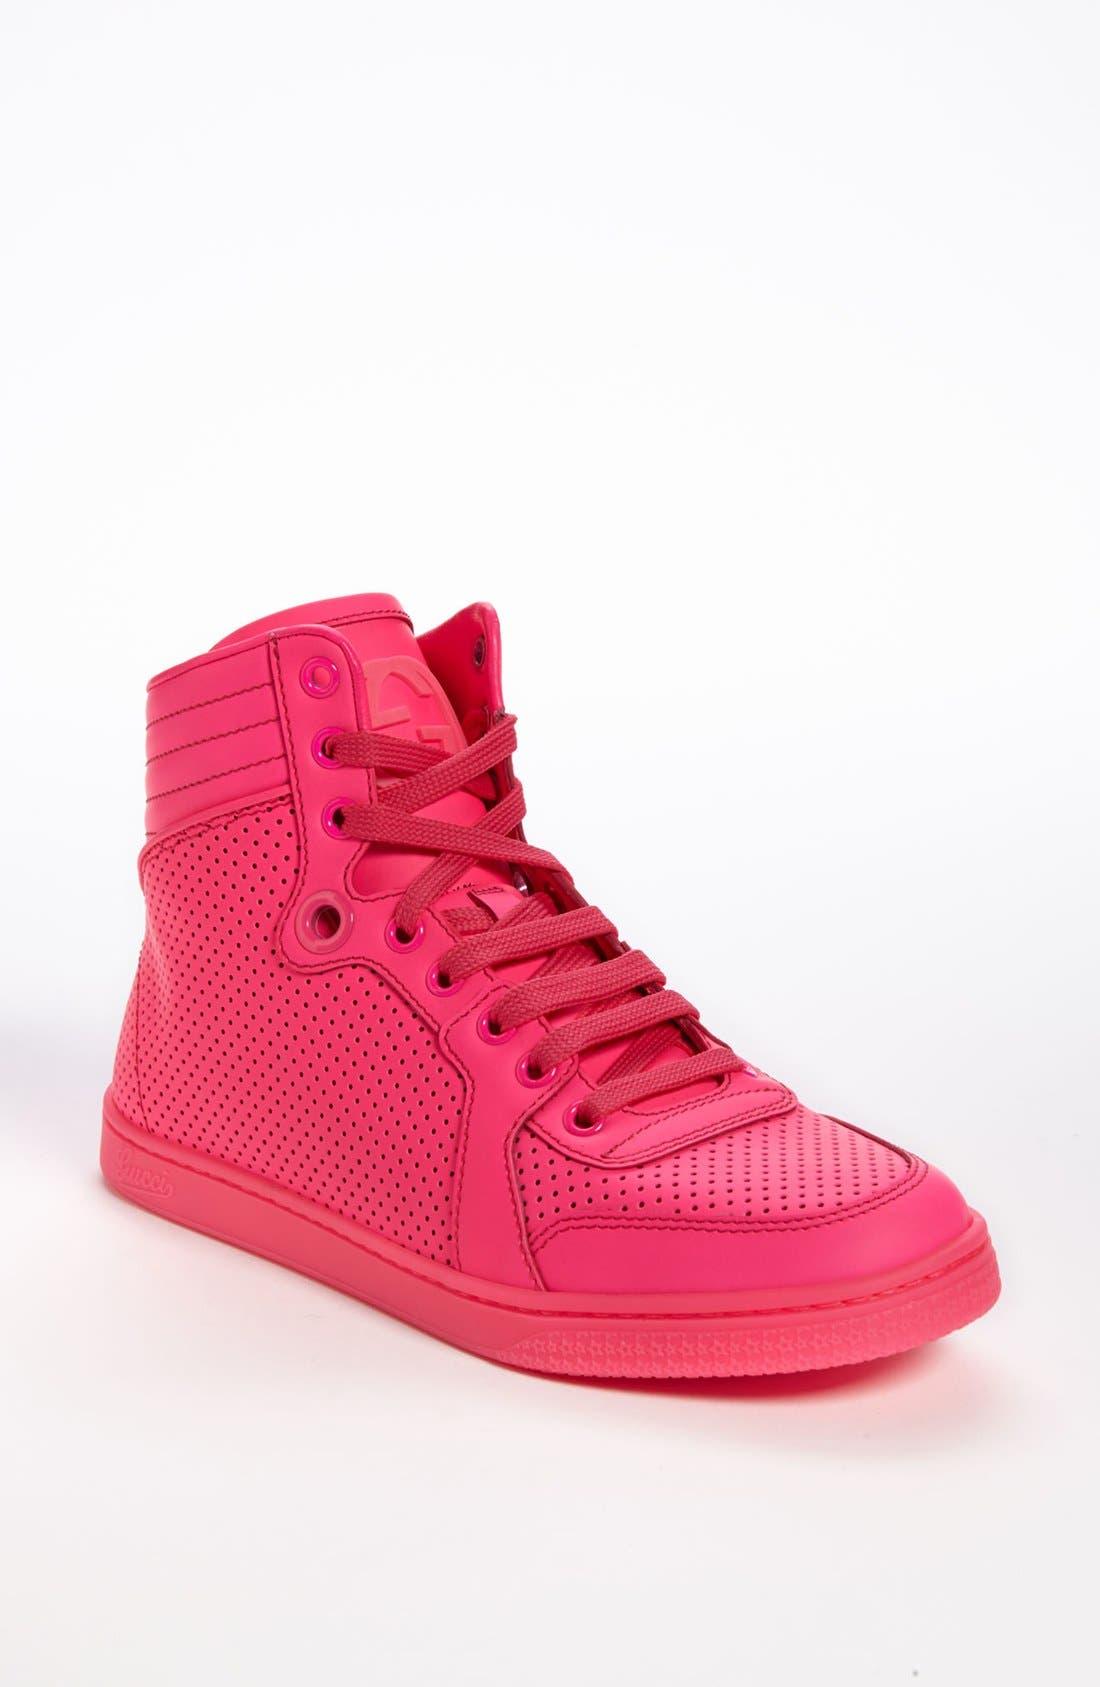 Main Image - Gucci 'Coda' High Top Sneaker